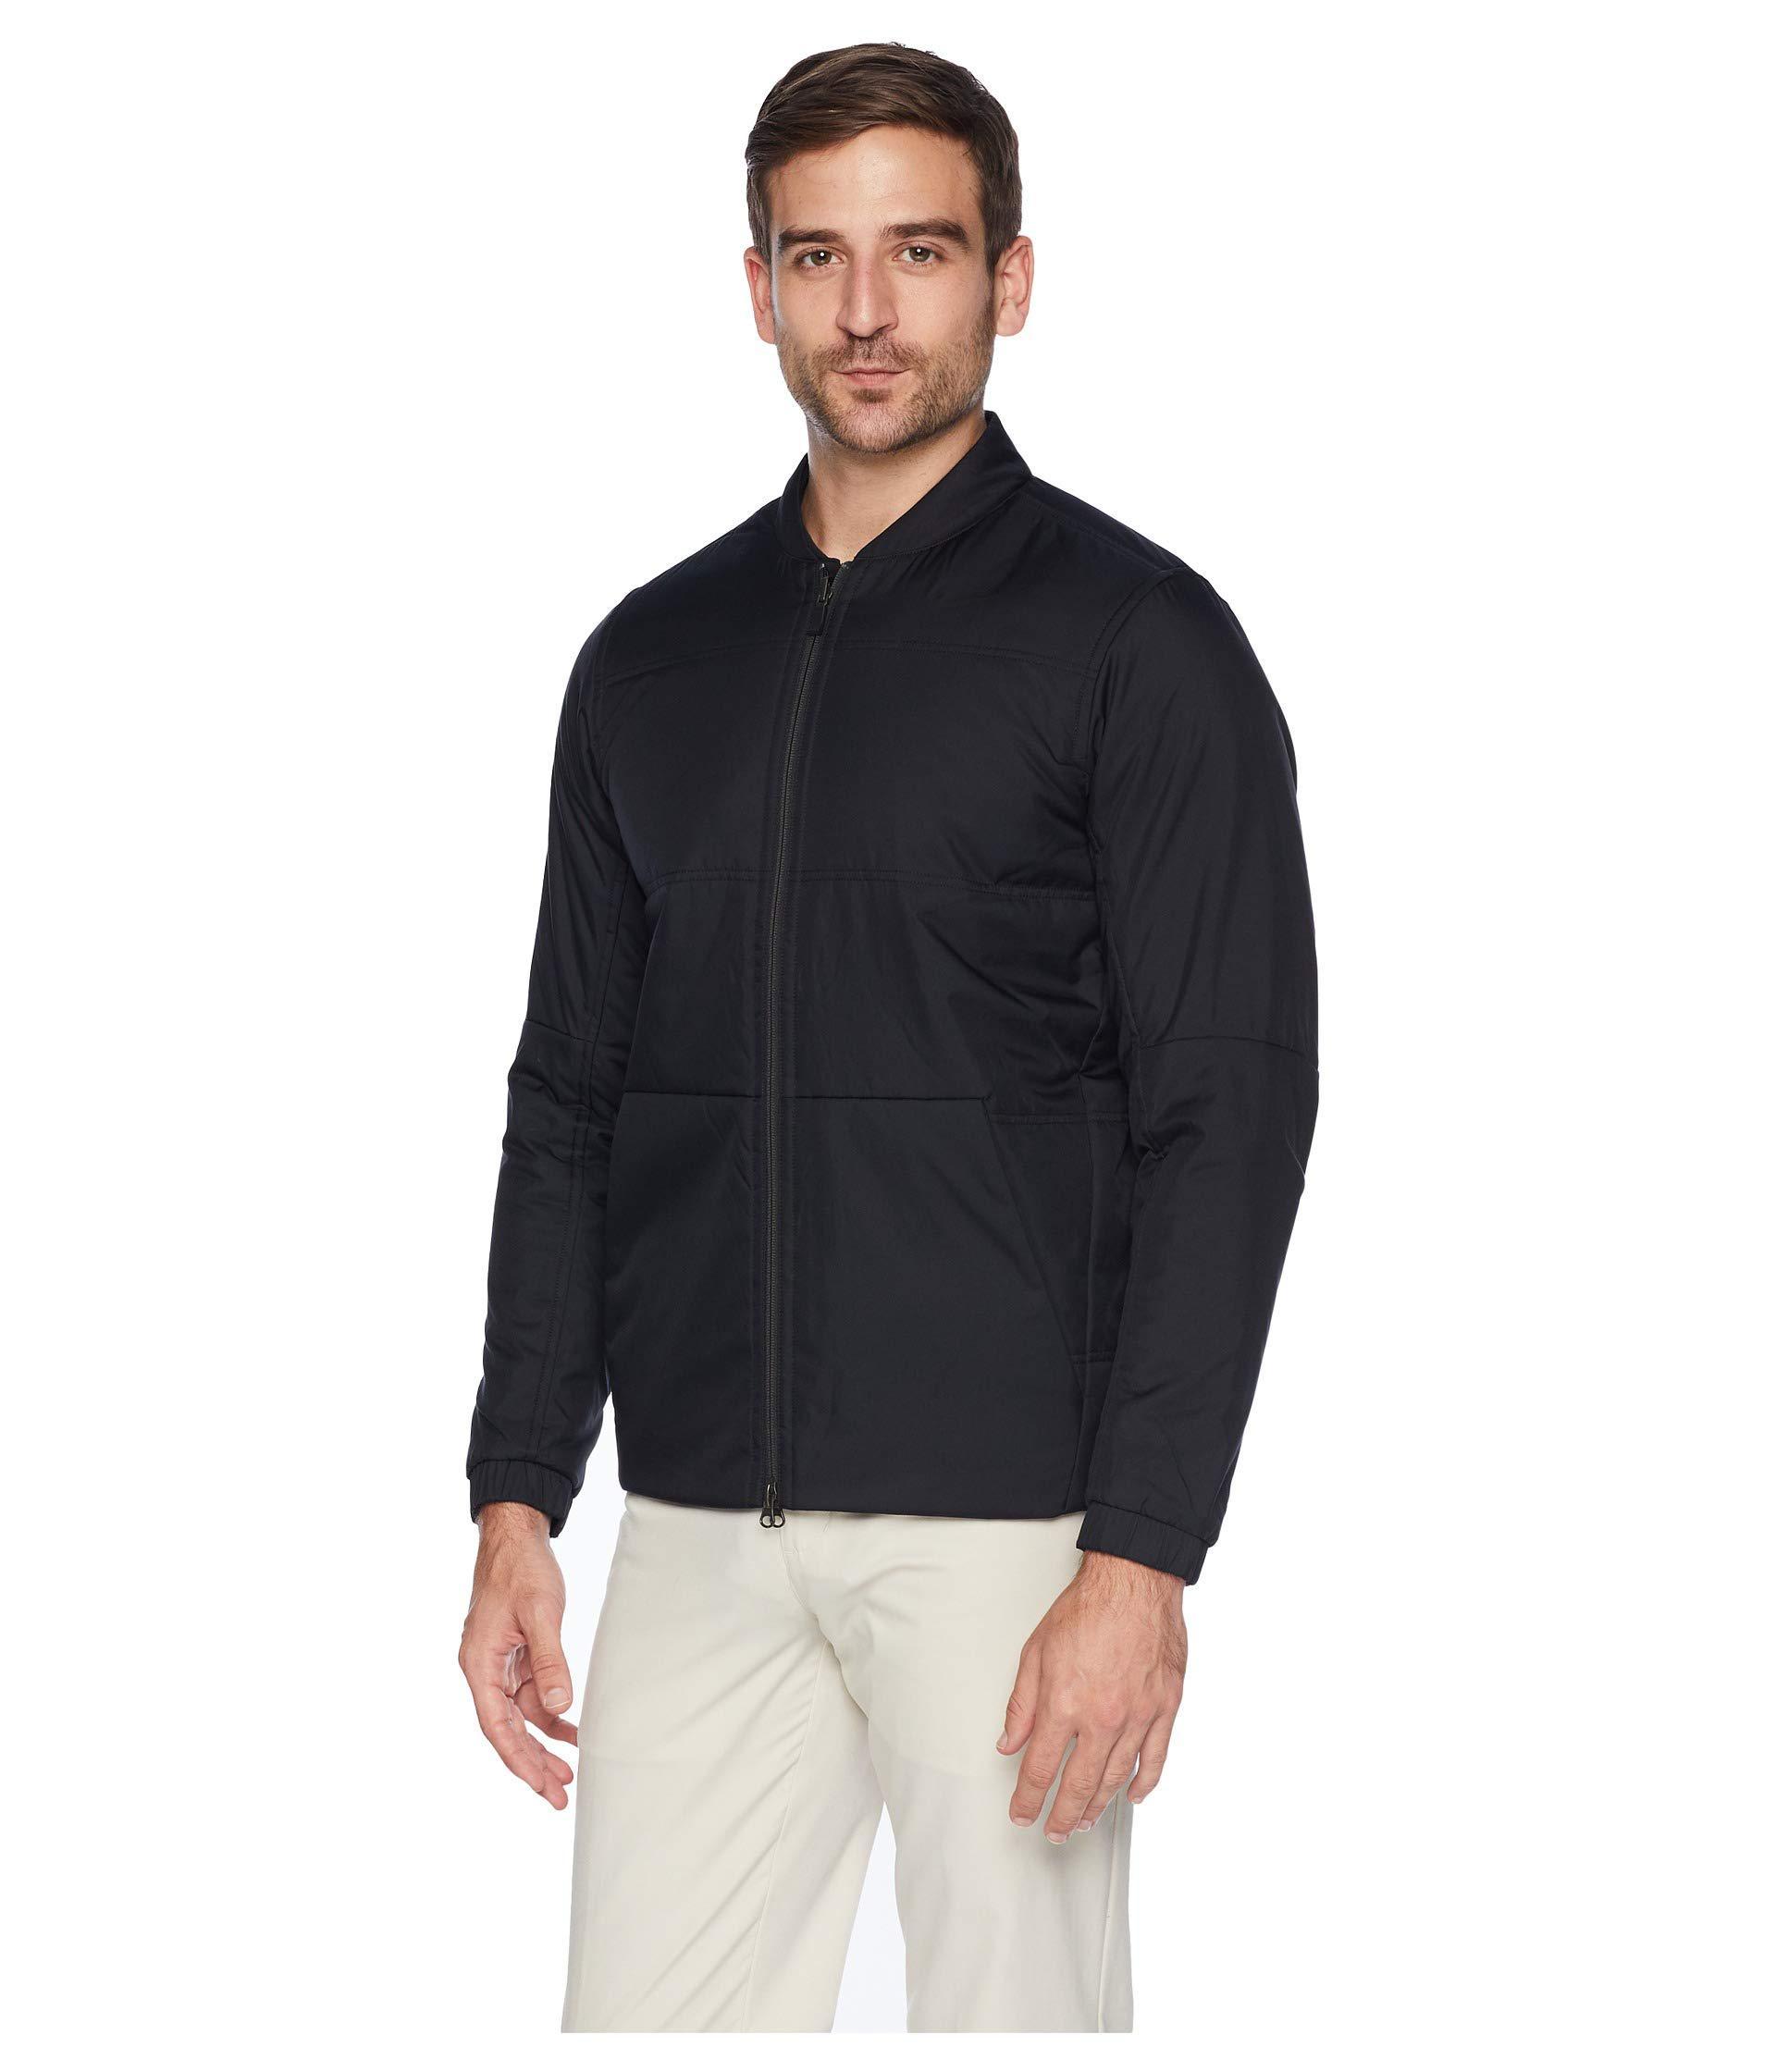 Lyst - Nike Synthetic Fill Jacket Core (black black black) Men s Coat in  Black for Men 5071d9f8b